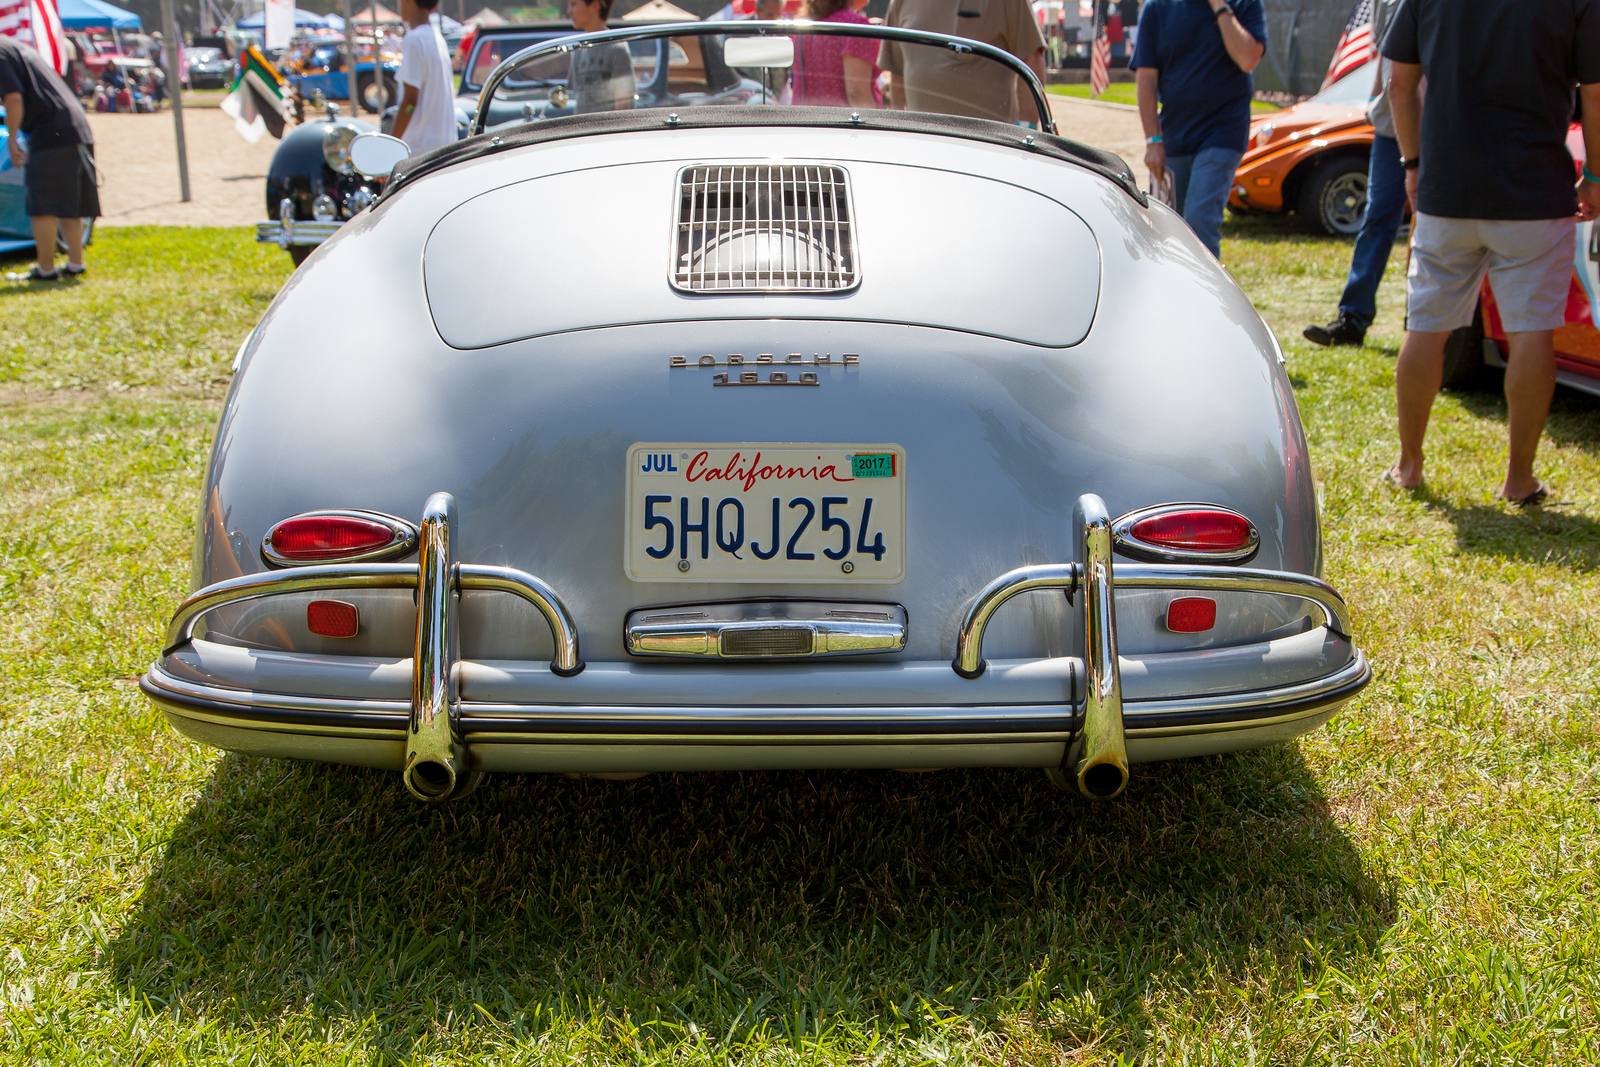 1958 Porsche 1600 Speedster, owned by Bruce Brown